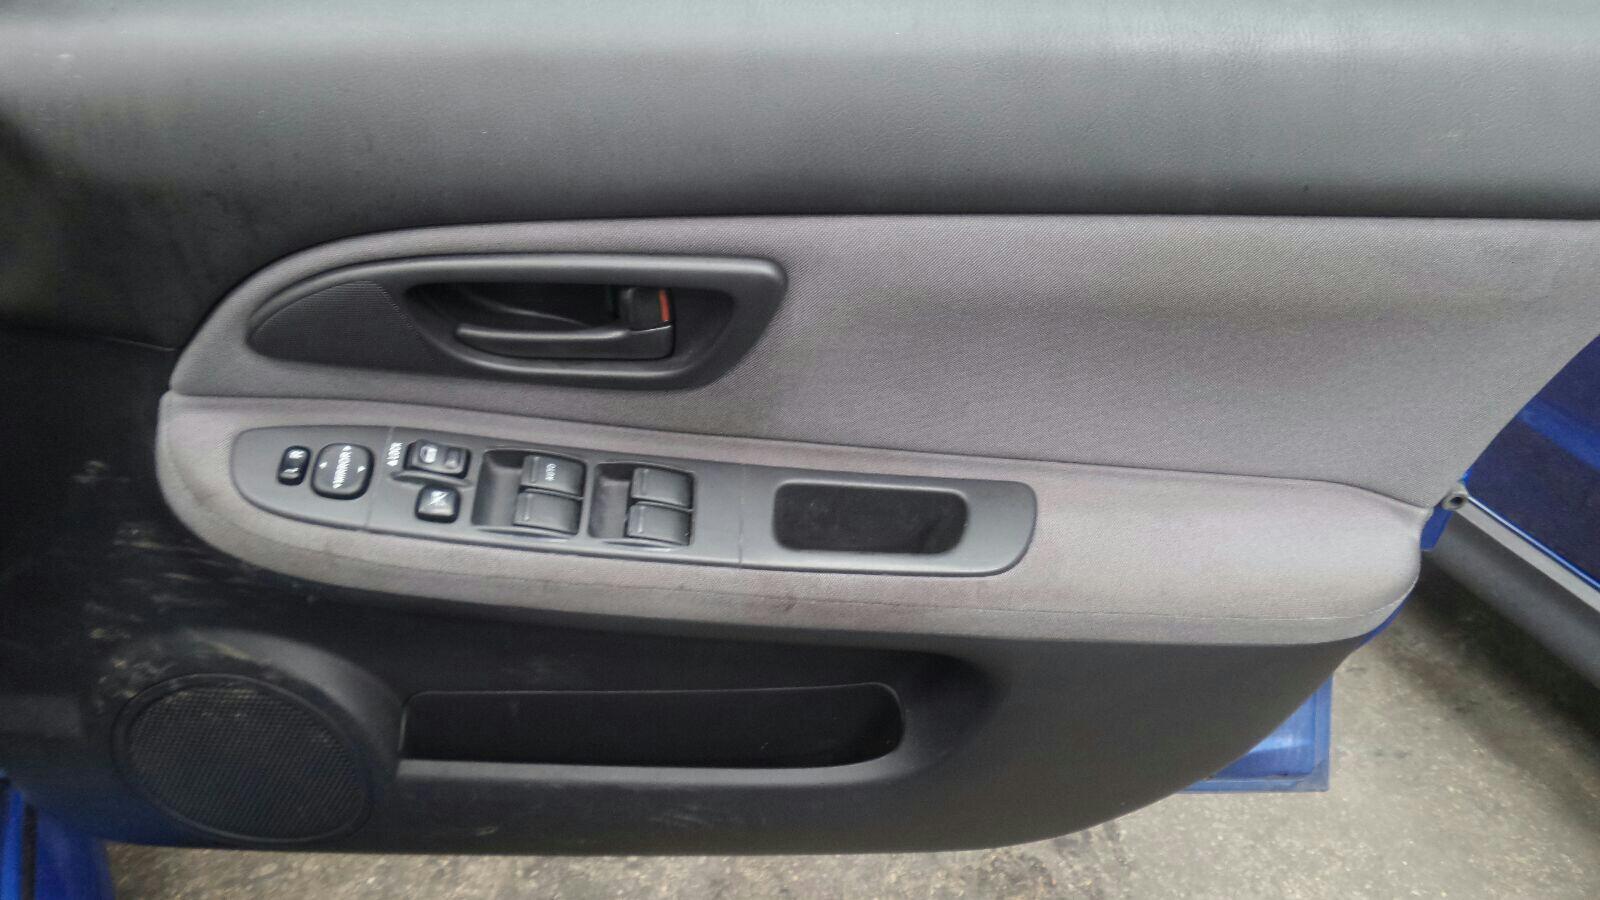 View Auto part Subaru Impreza 2006 4 Door Saloon